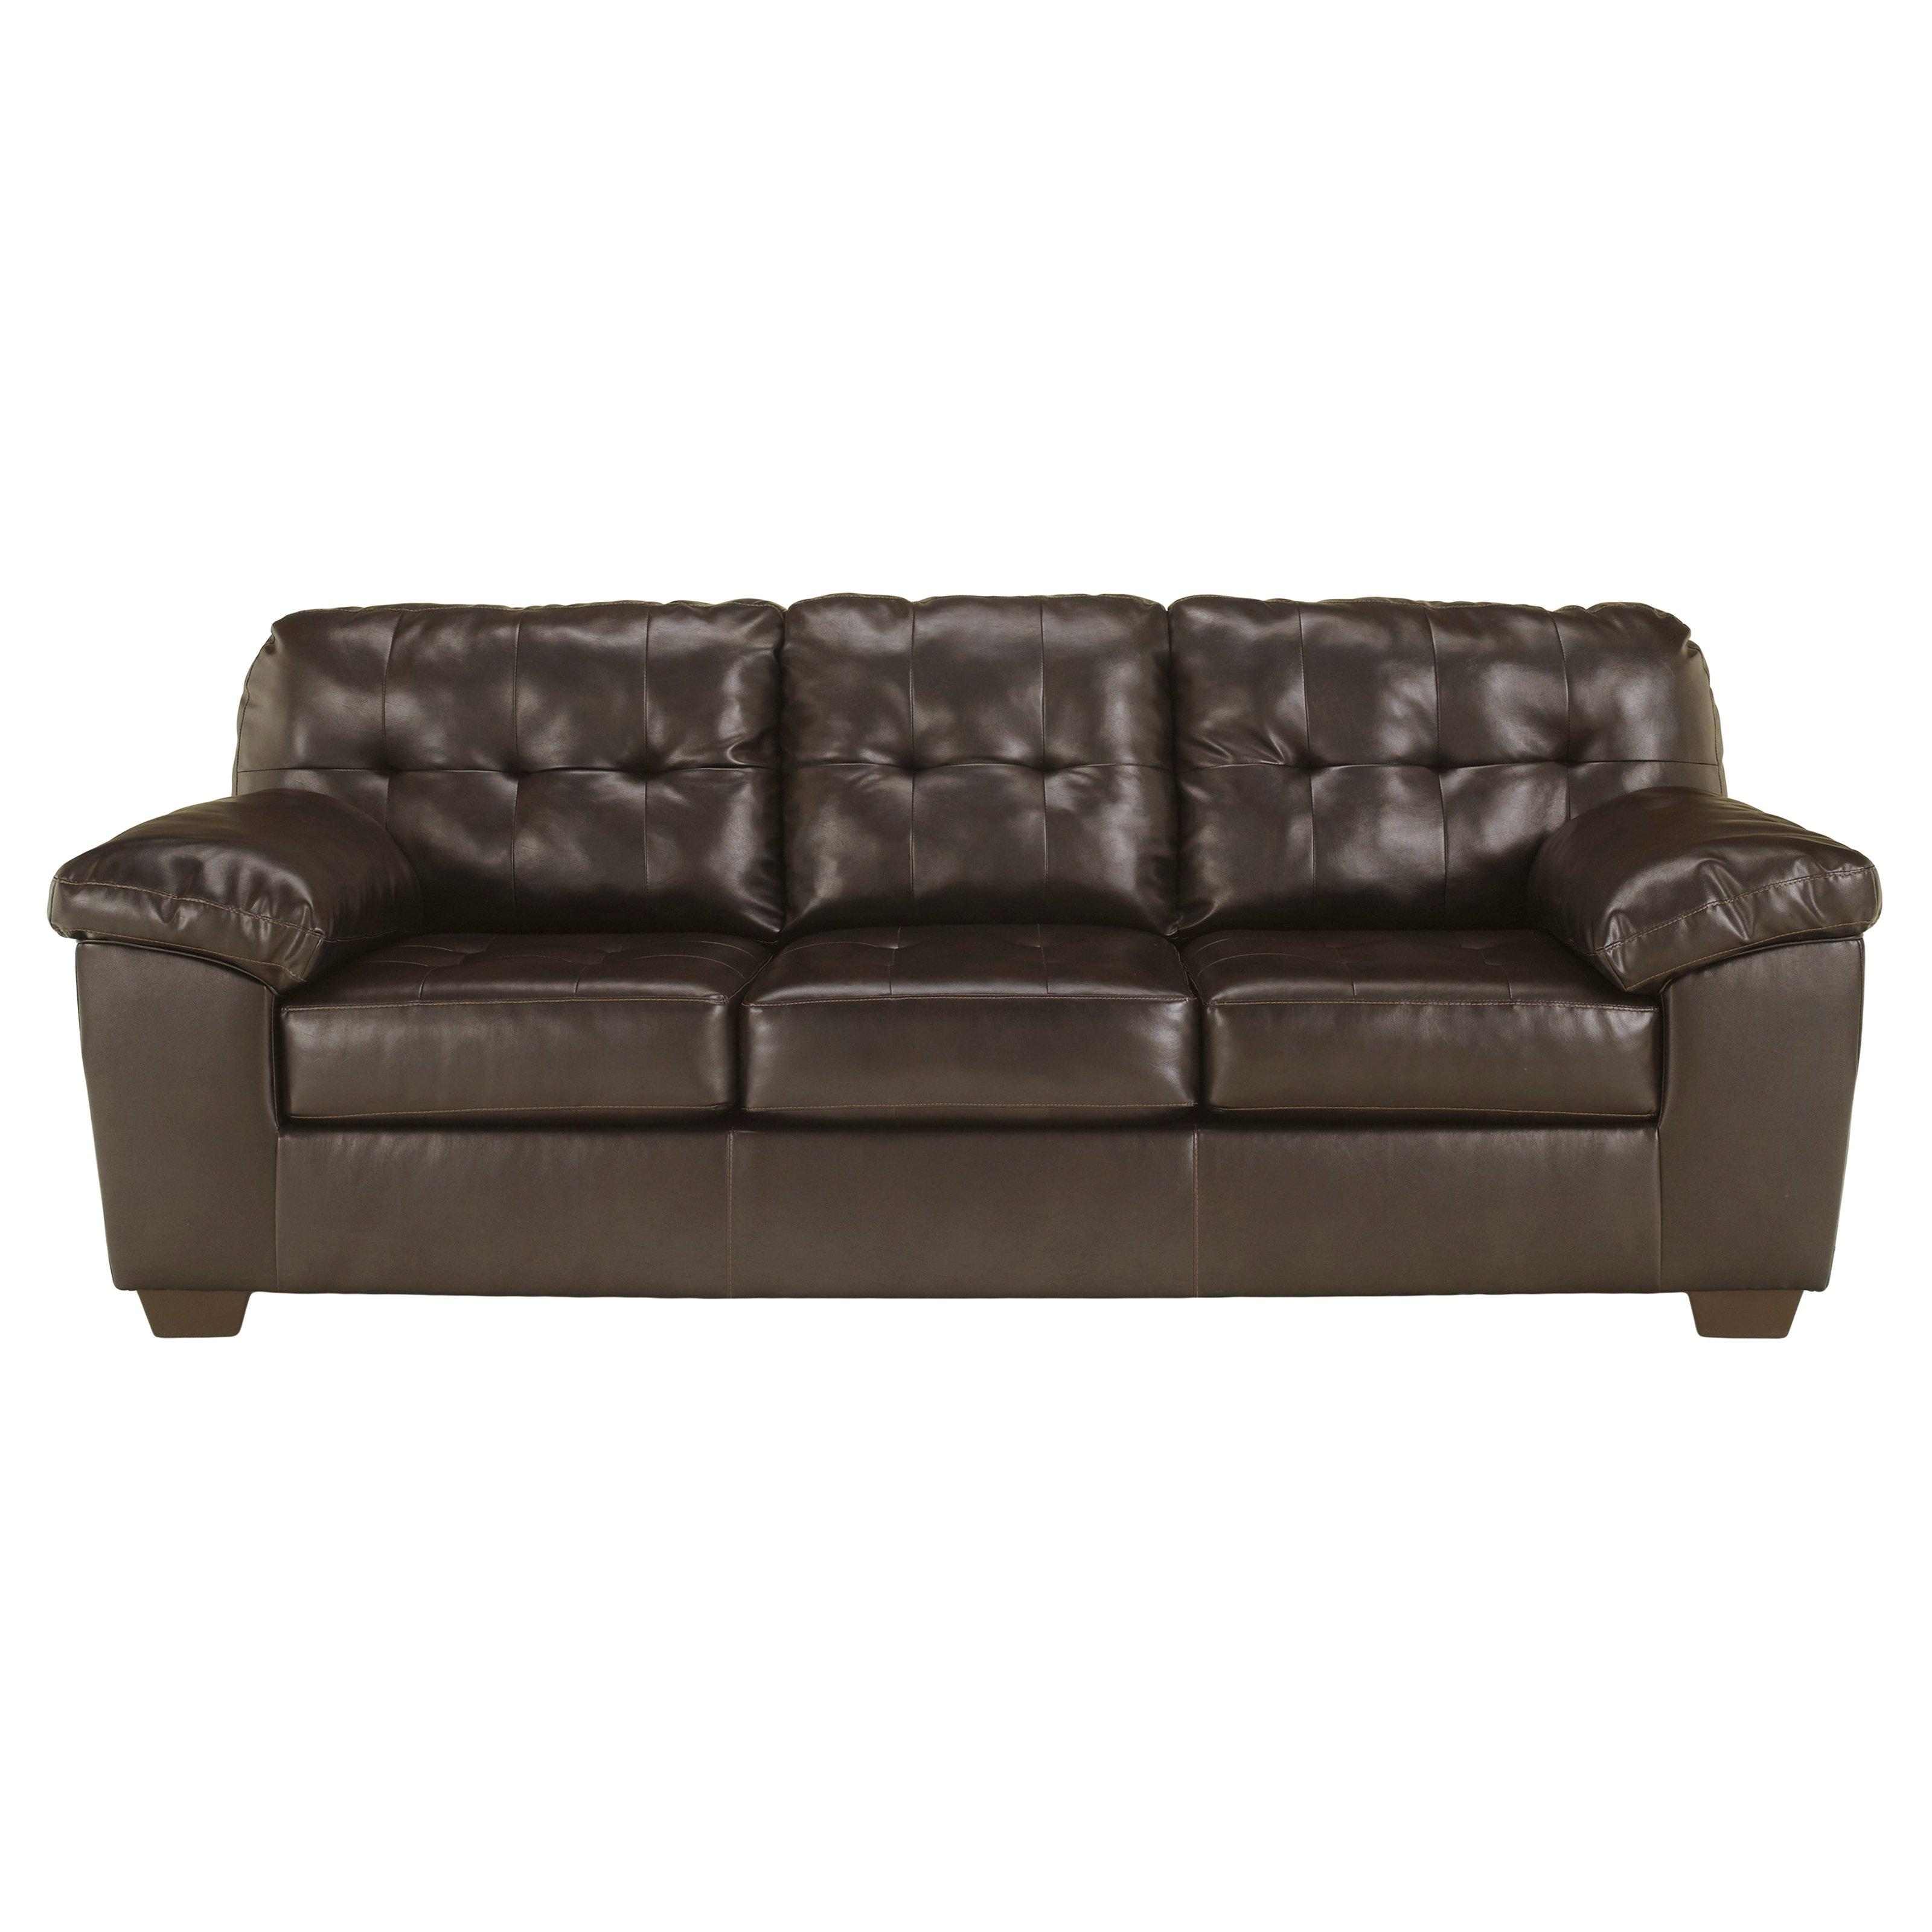 Signature Design by Ashley Alliston Leather Sofa